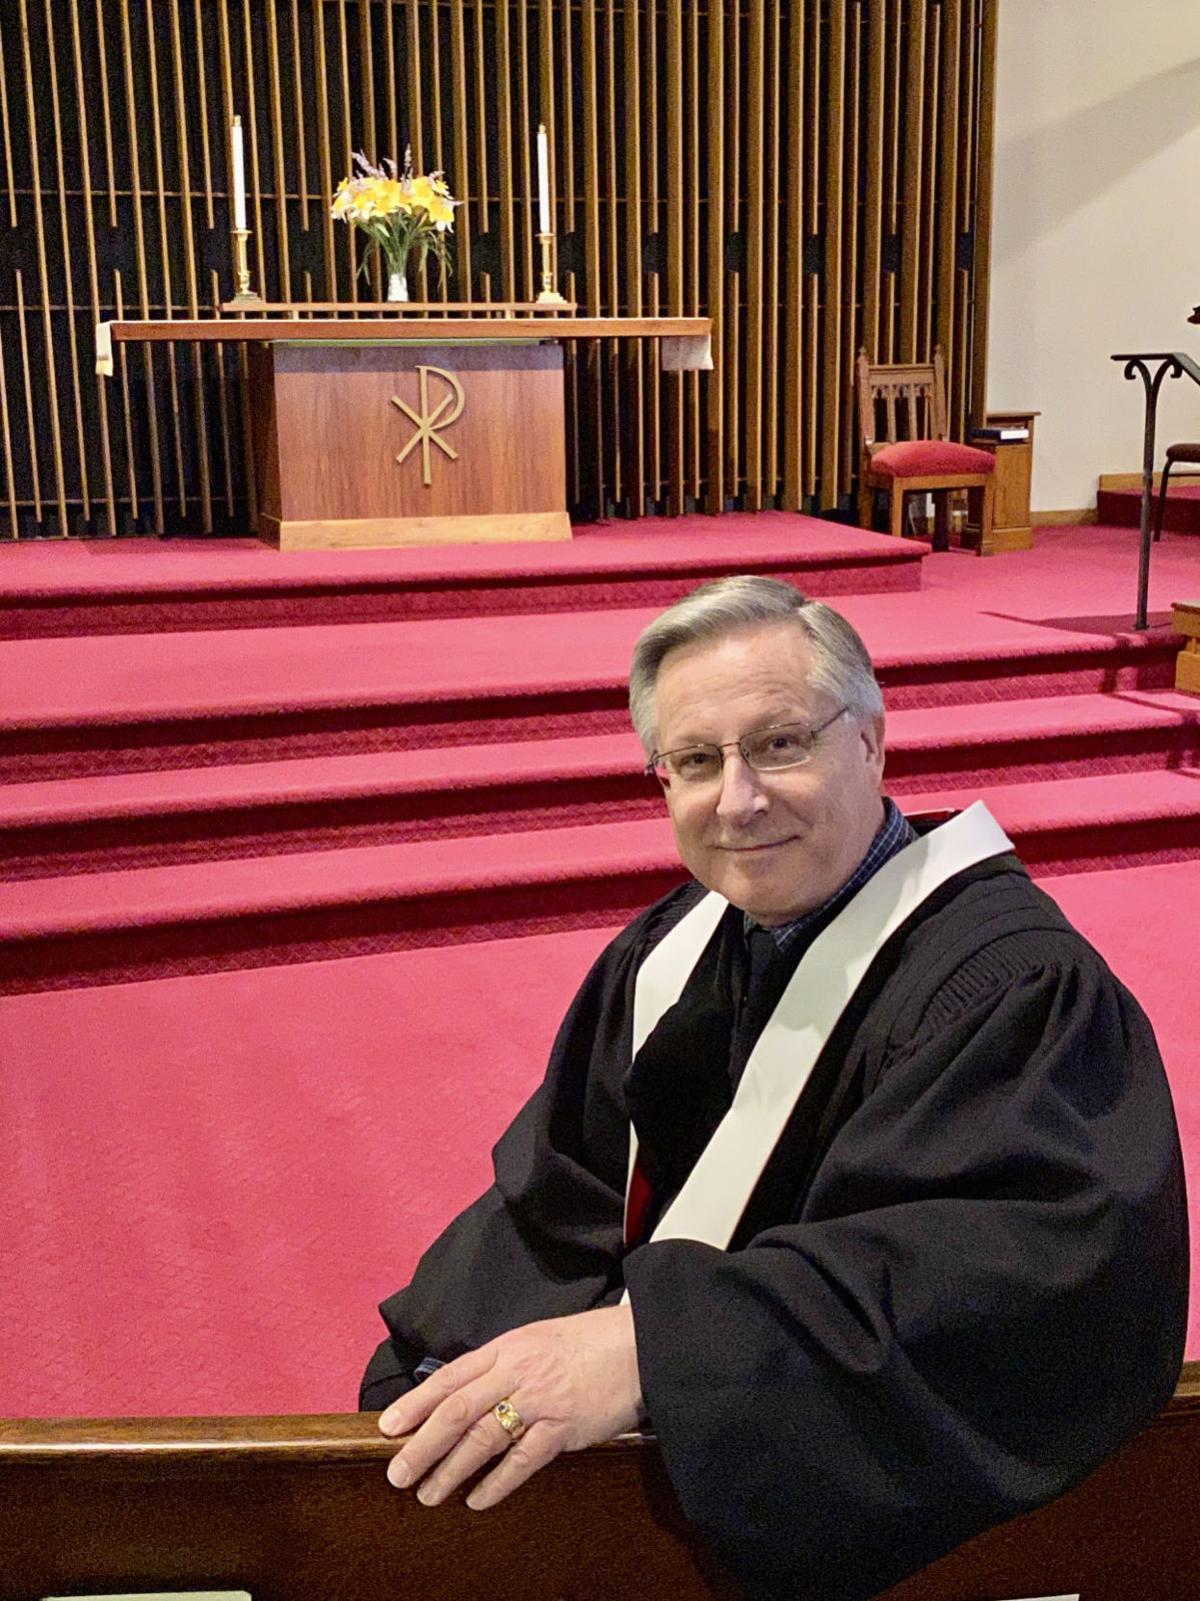 Wayne Earl, minister